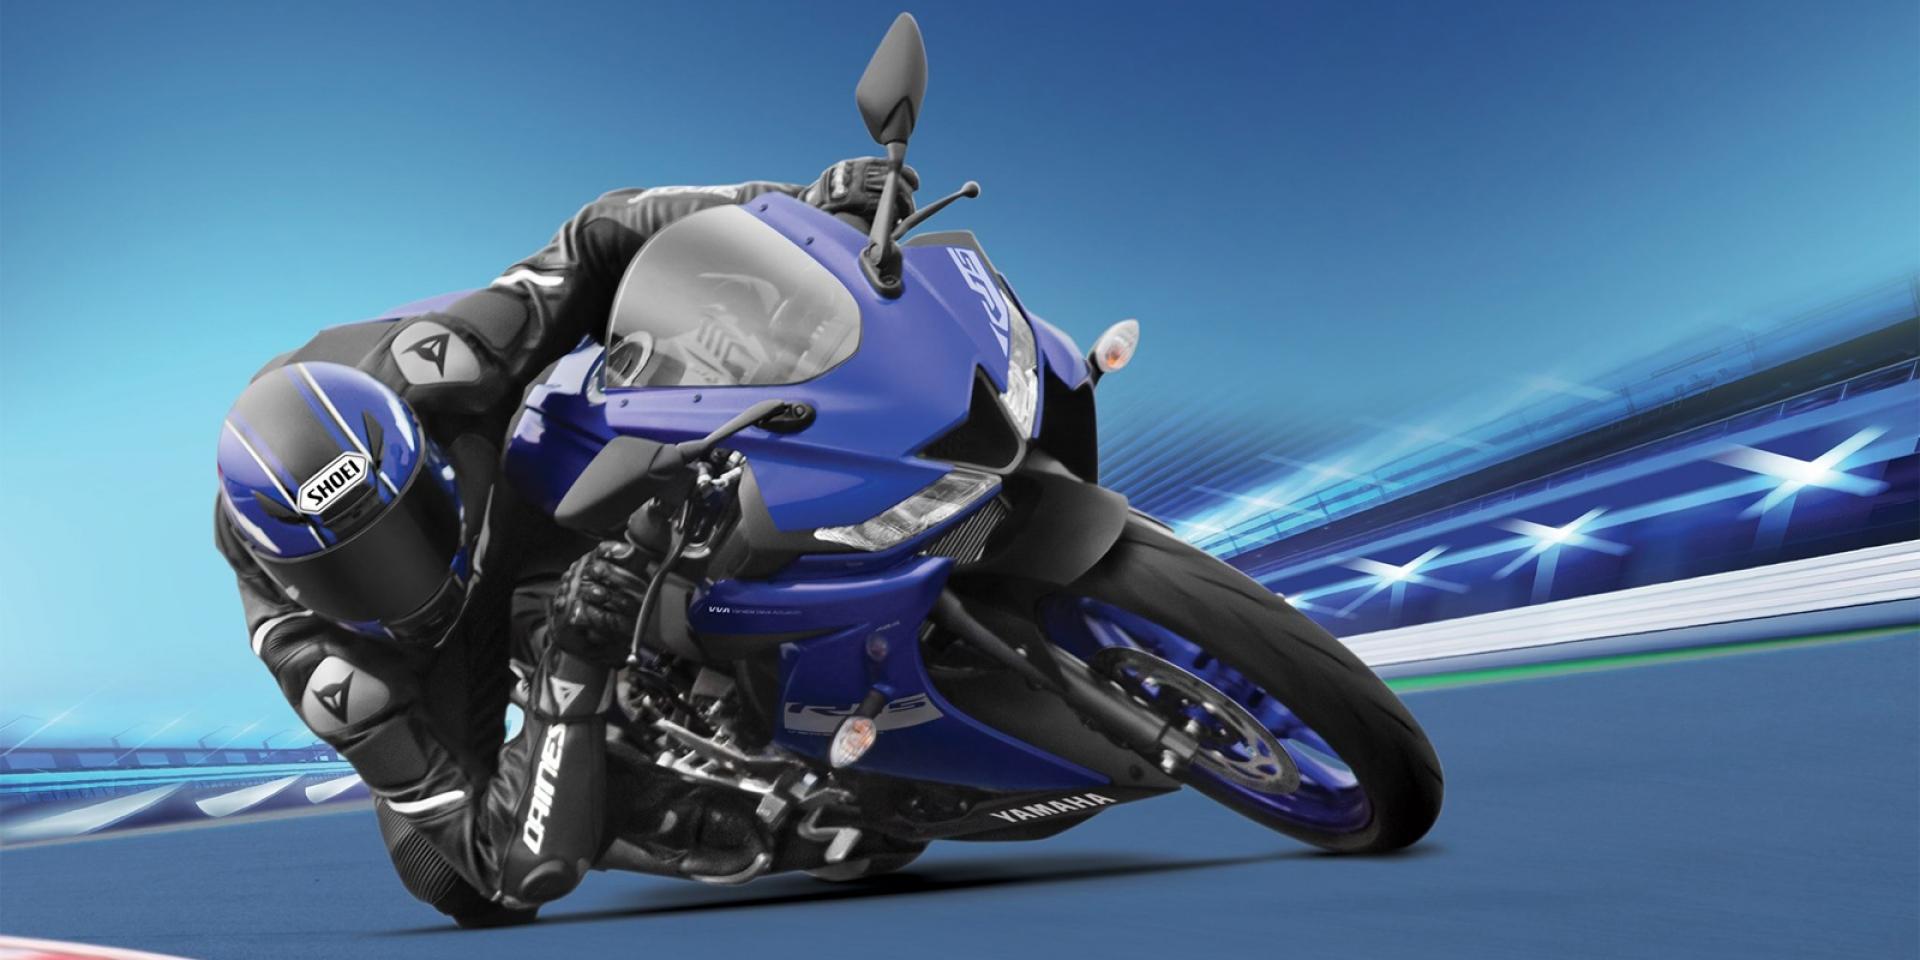 YAMAHA台灣山葉宣布導入YZF-R15,引進正叉配ABS版本!